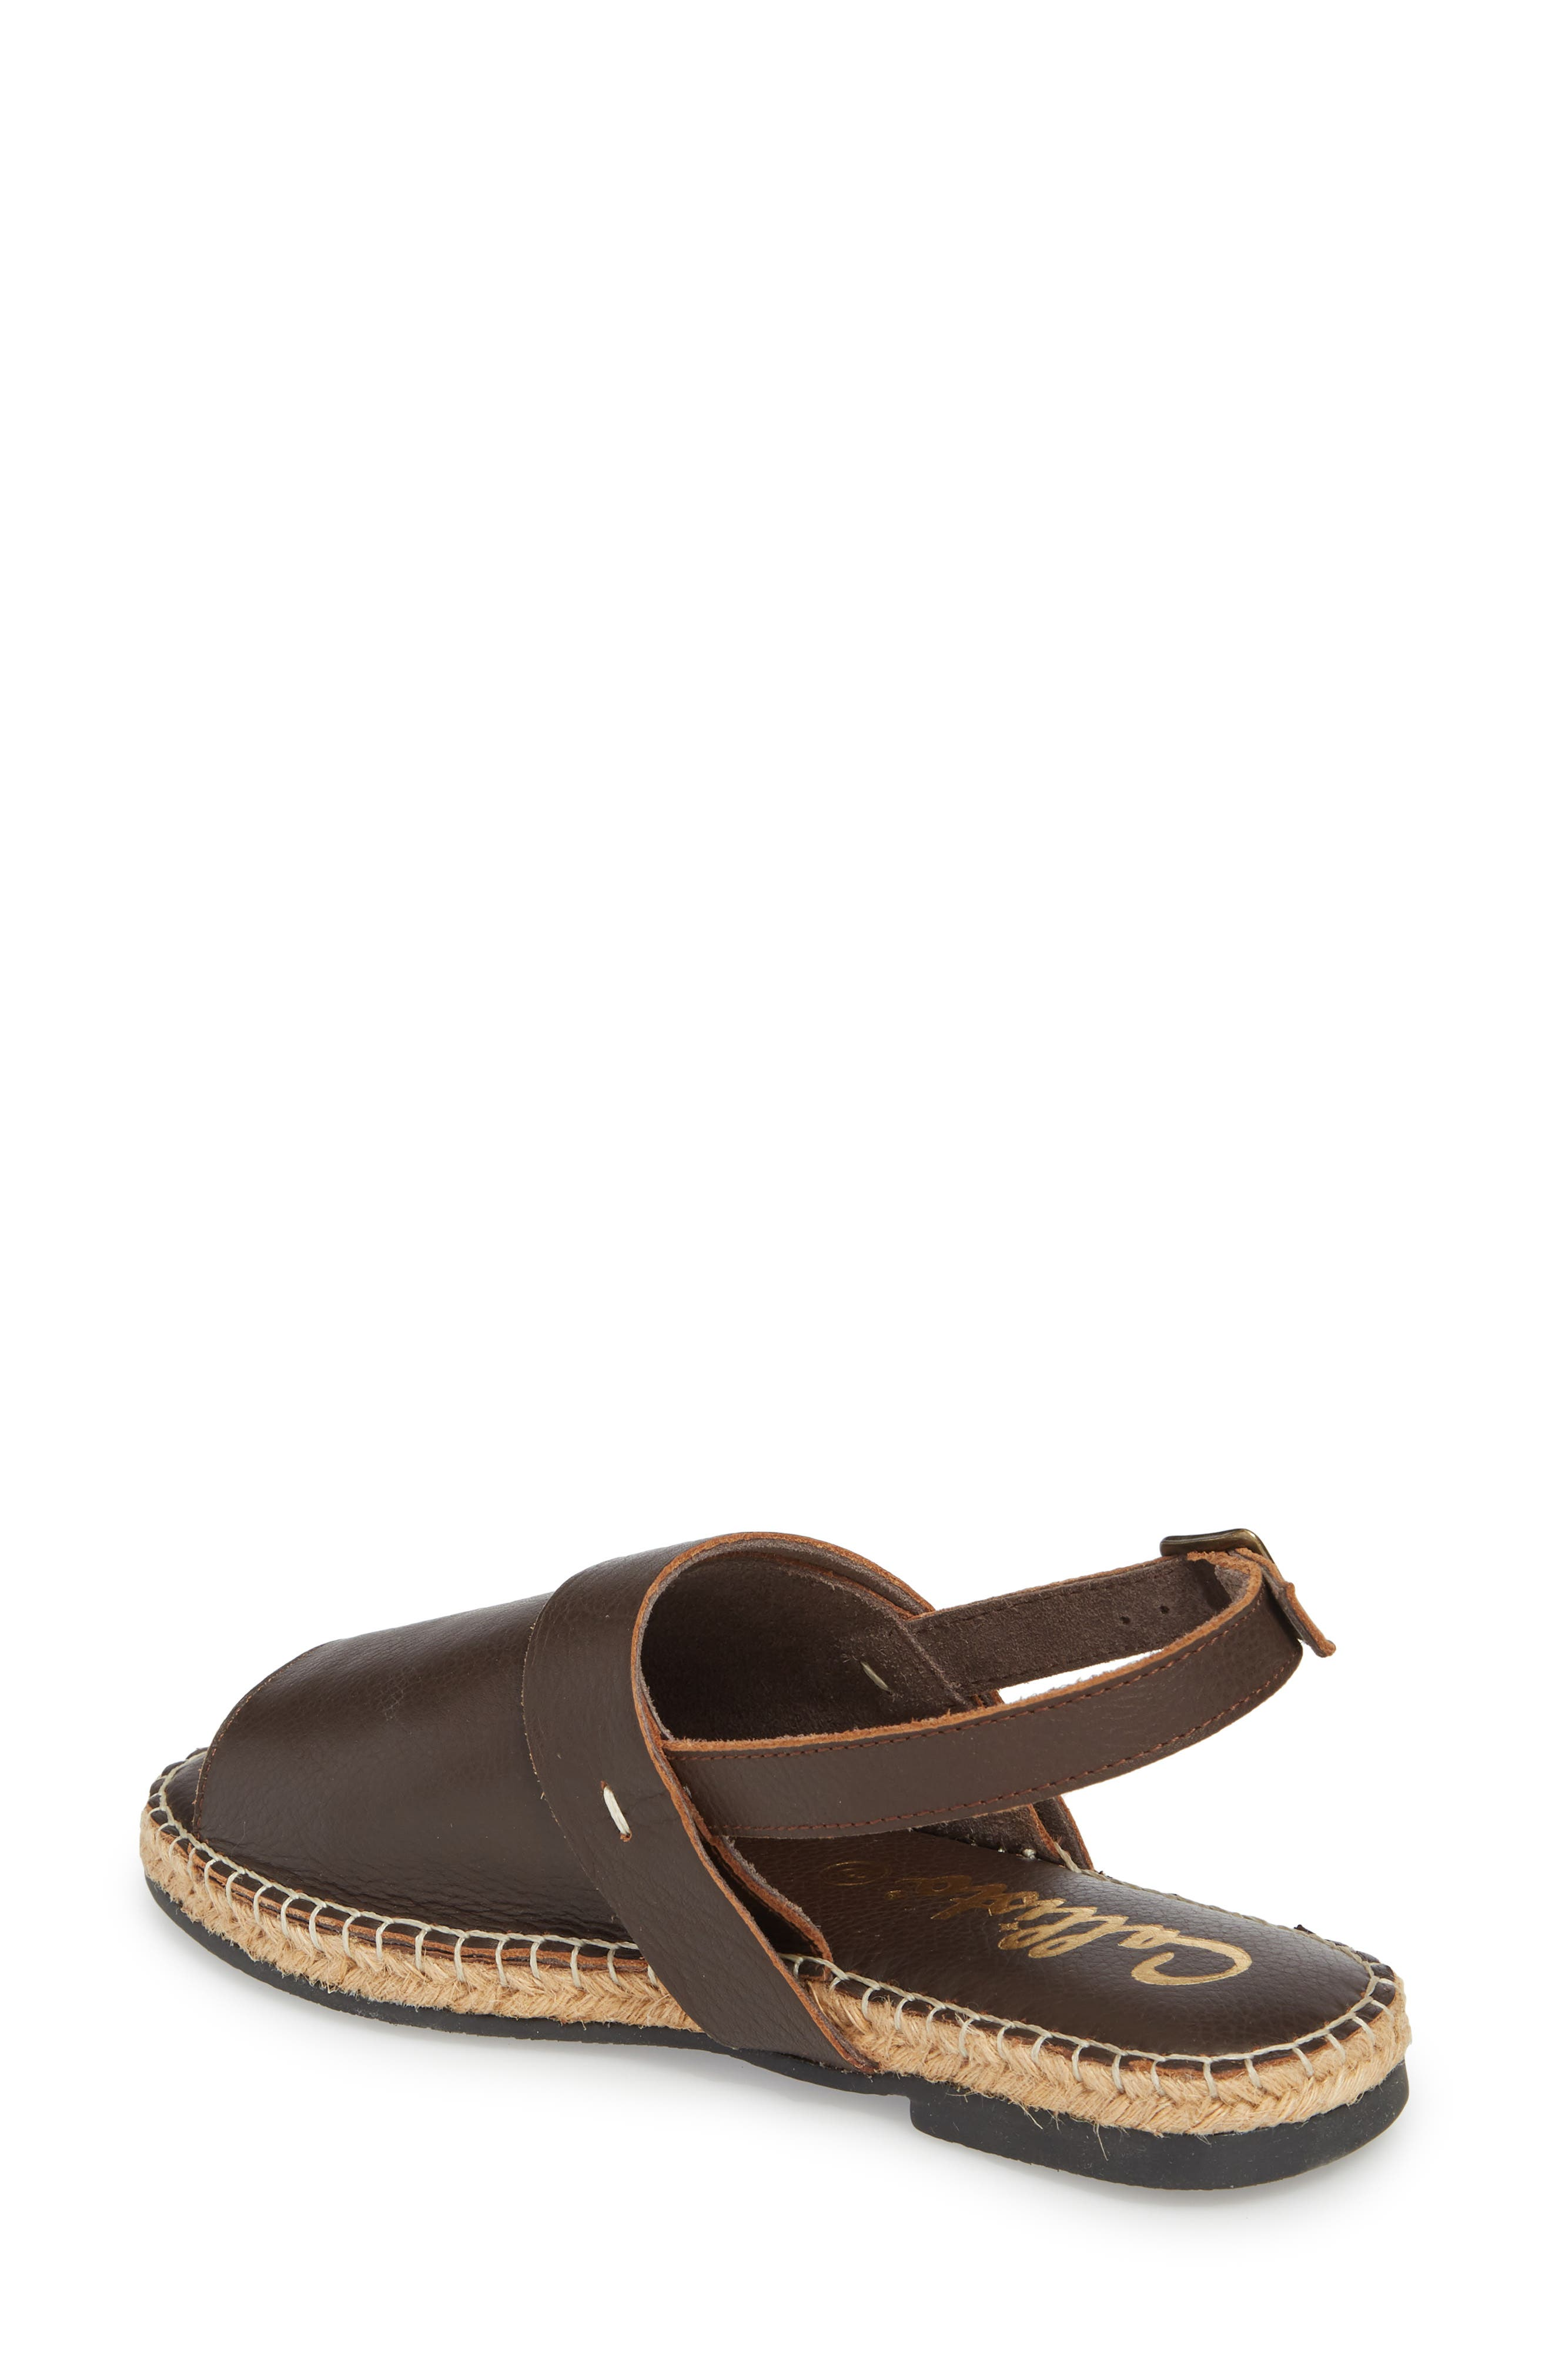 Turn Key Espadrille Sandal,                             Alternate thumbnail 2, color,                             Brown Leather